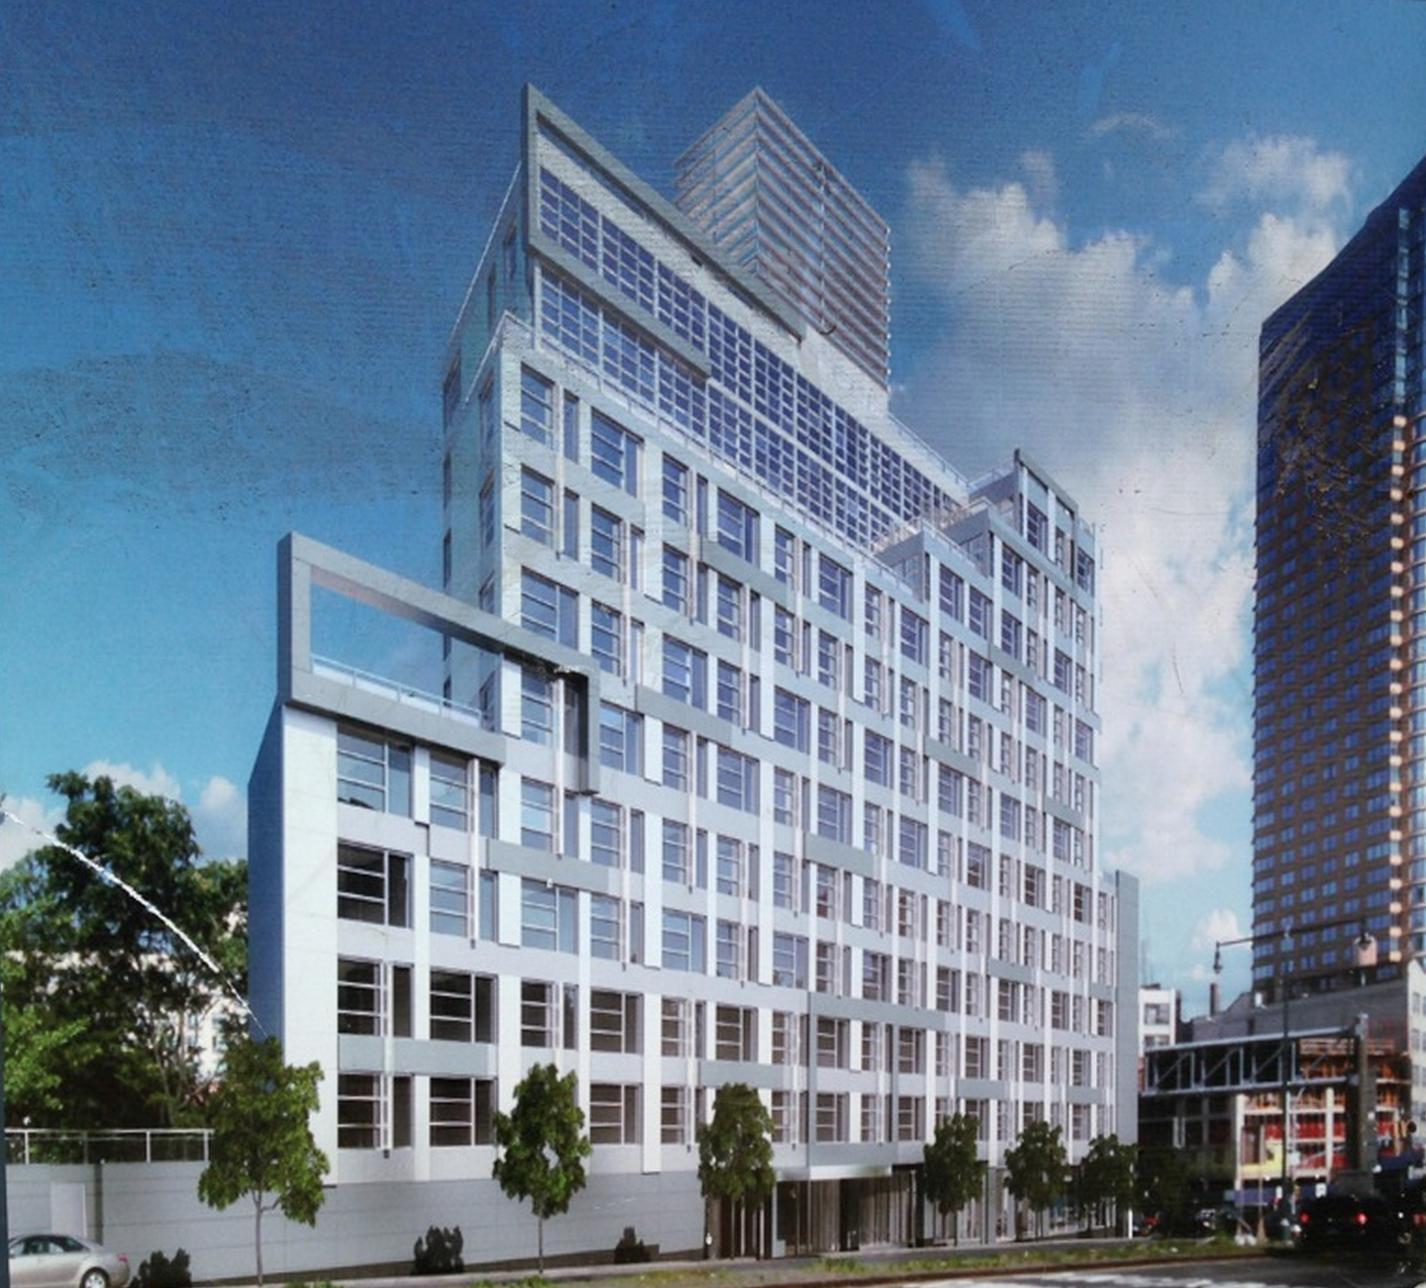 85 Flatbush Avenue Extension